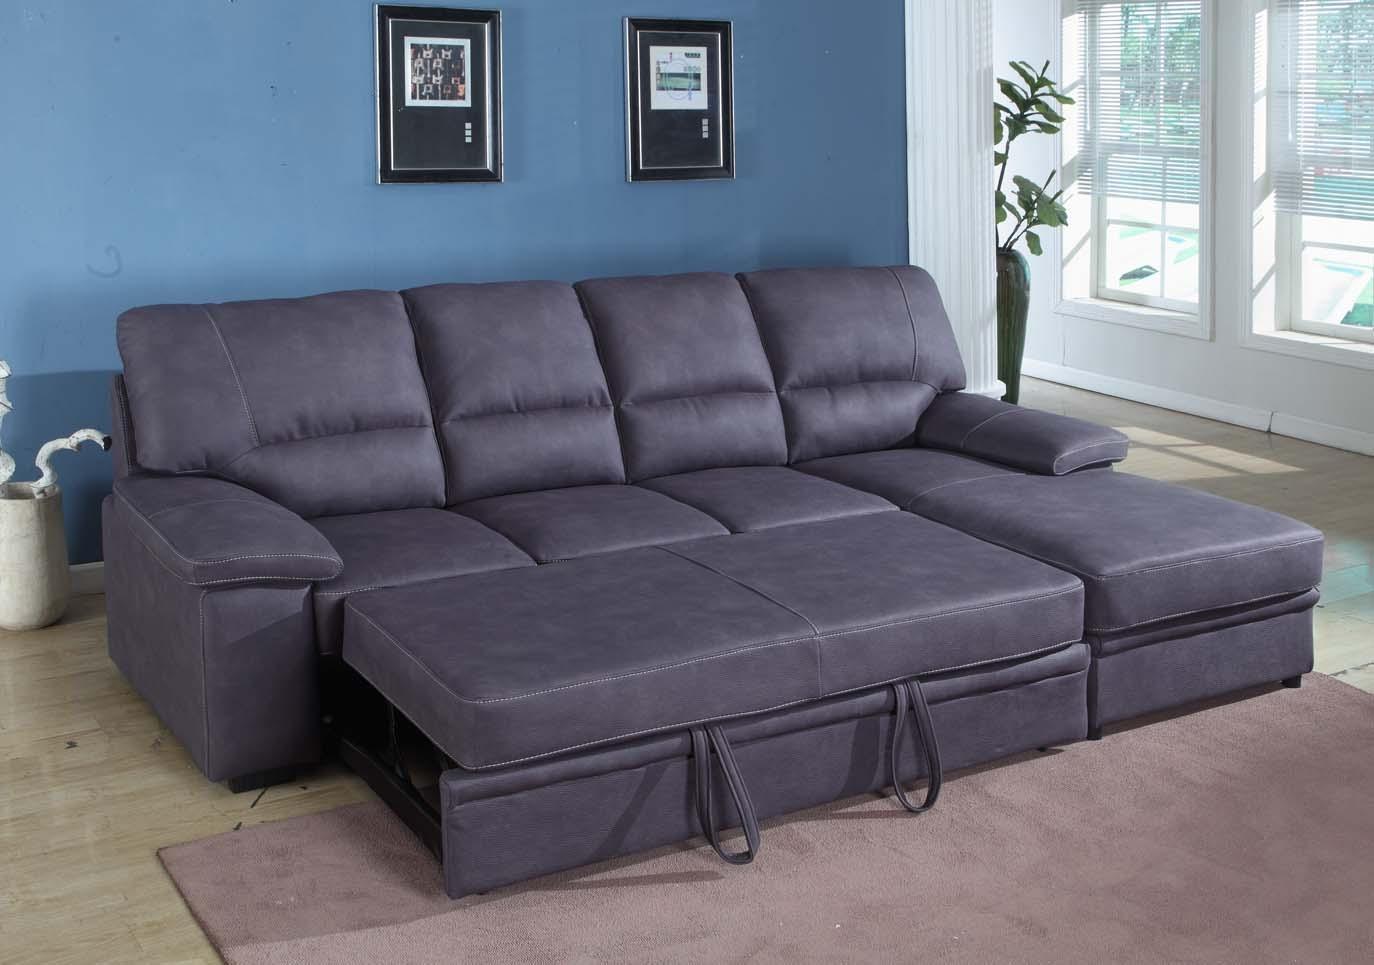 Gray Sectional Sofa | Home Designjohn Regarding Sectional Sofa Ideas (Image 15 of 20)